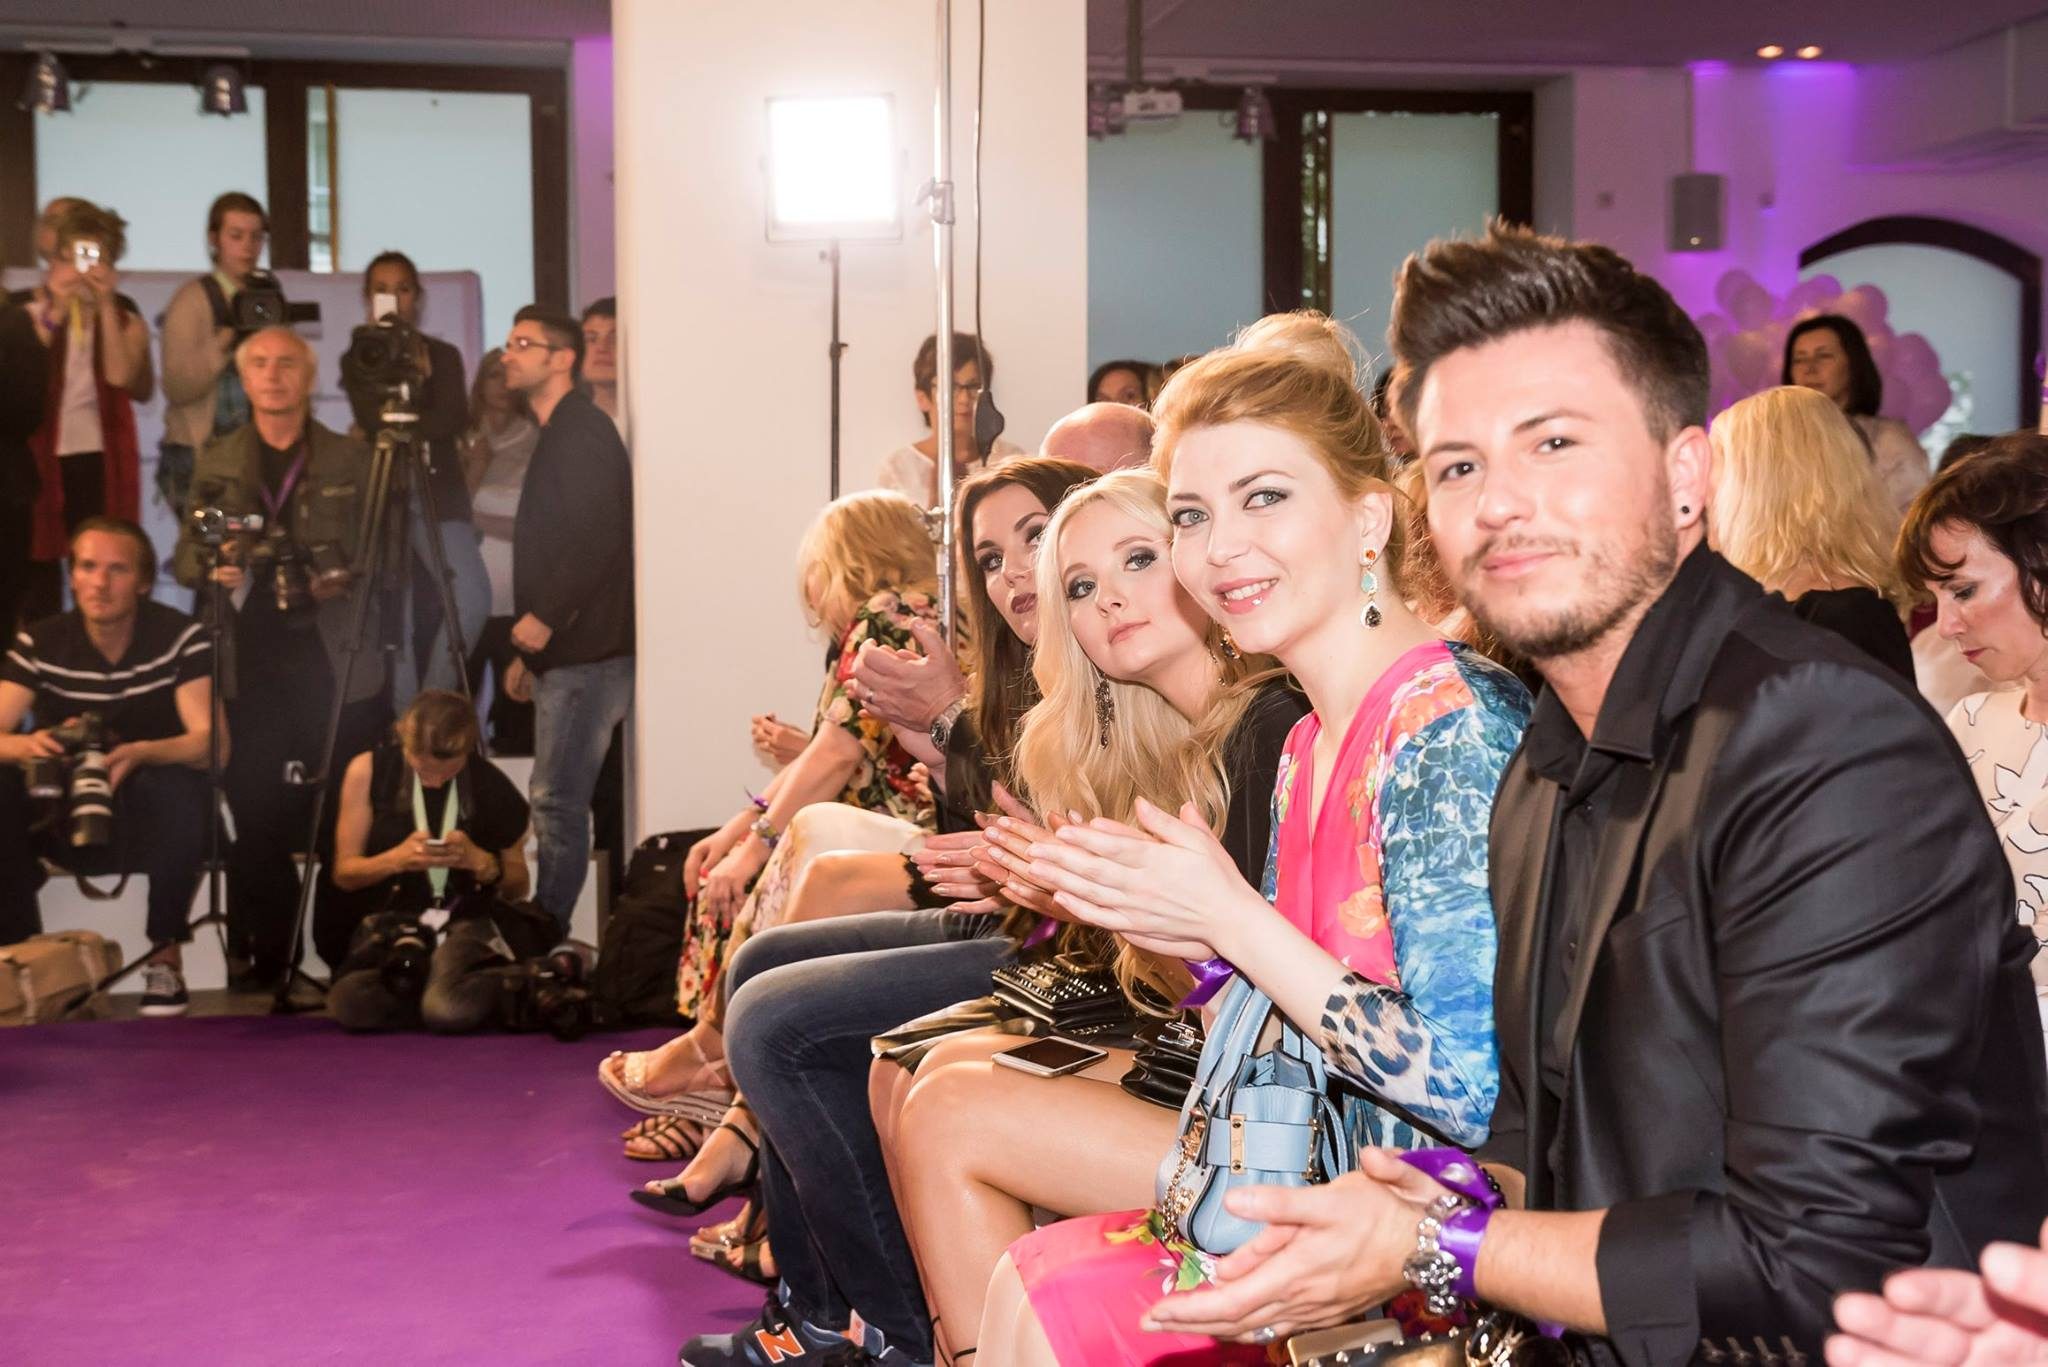 Publikum-Manoulenz-fashionshow-megabambi